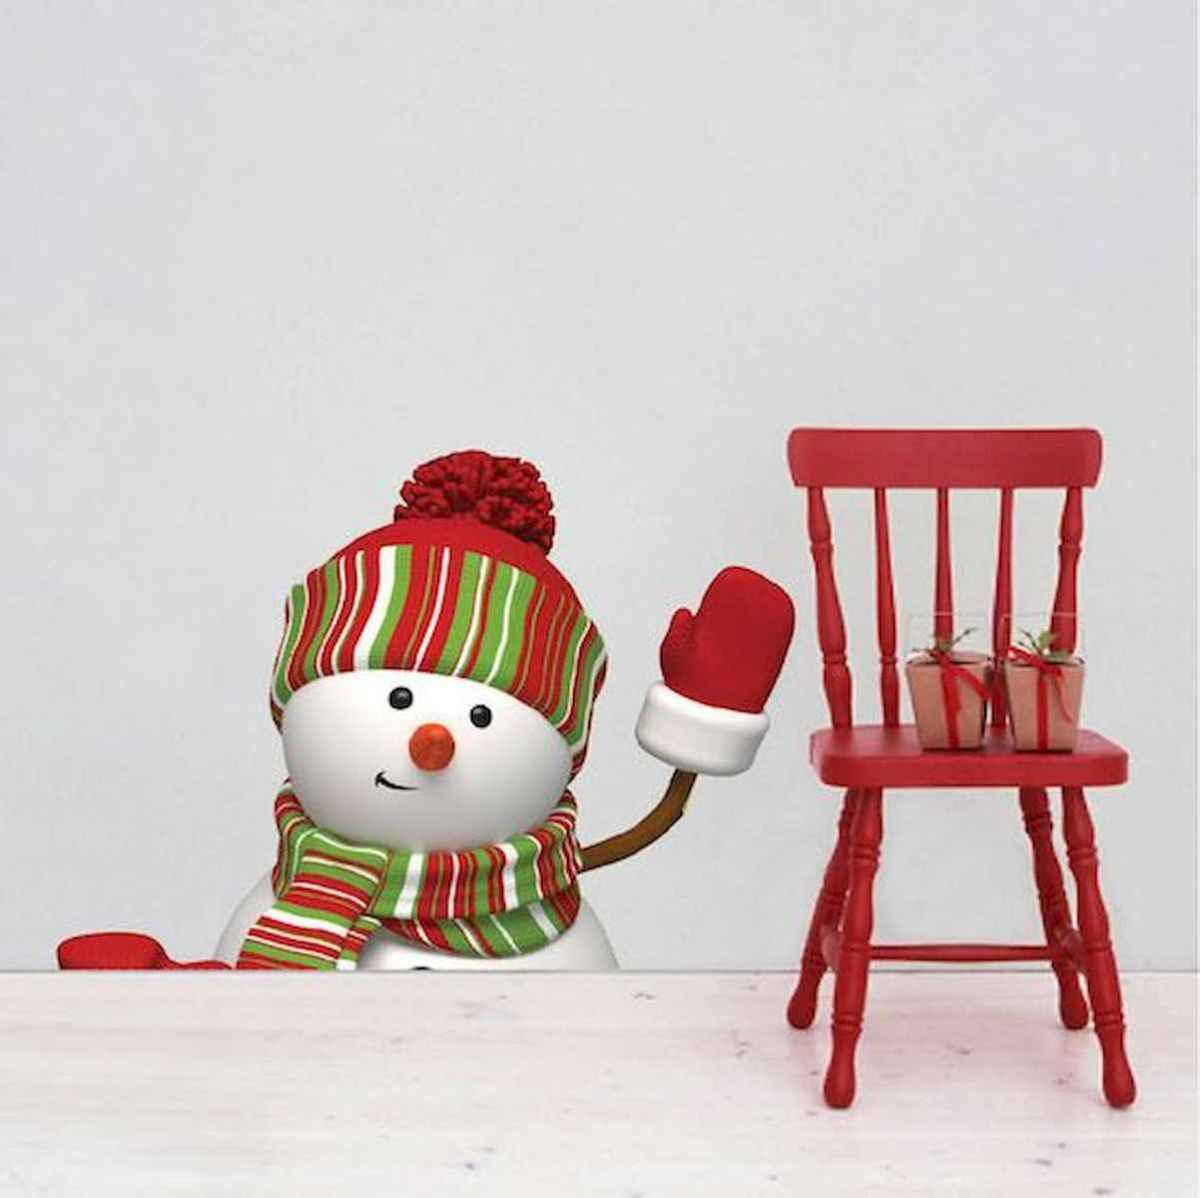 35 Awesome Apartment Christmas Decor Ideas (18)